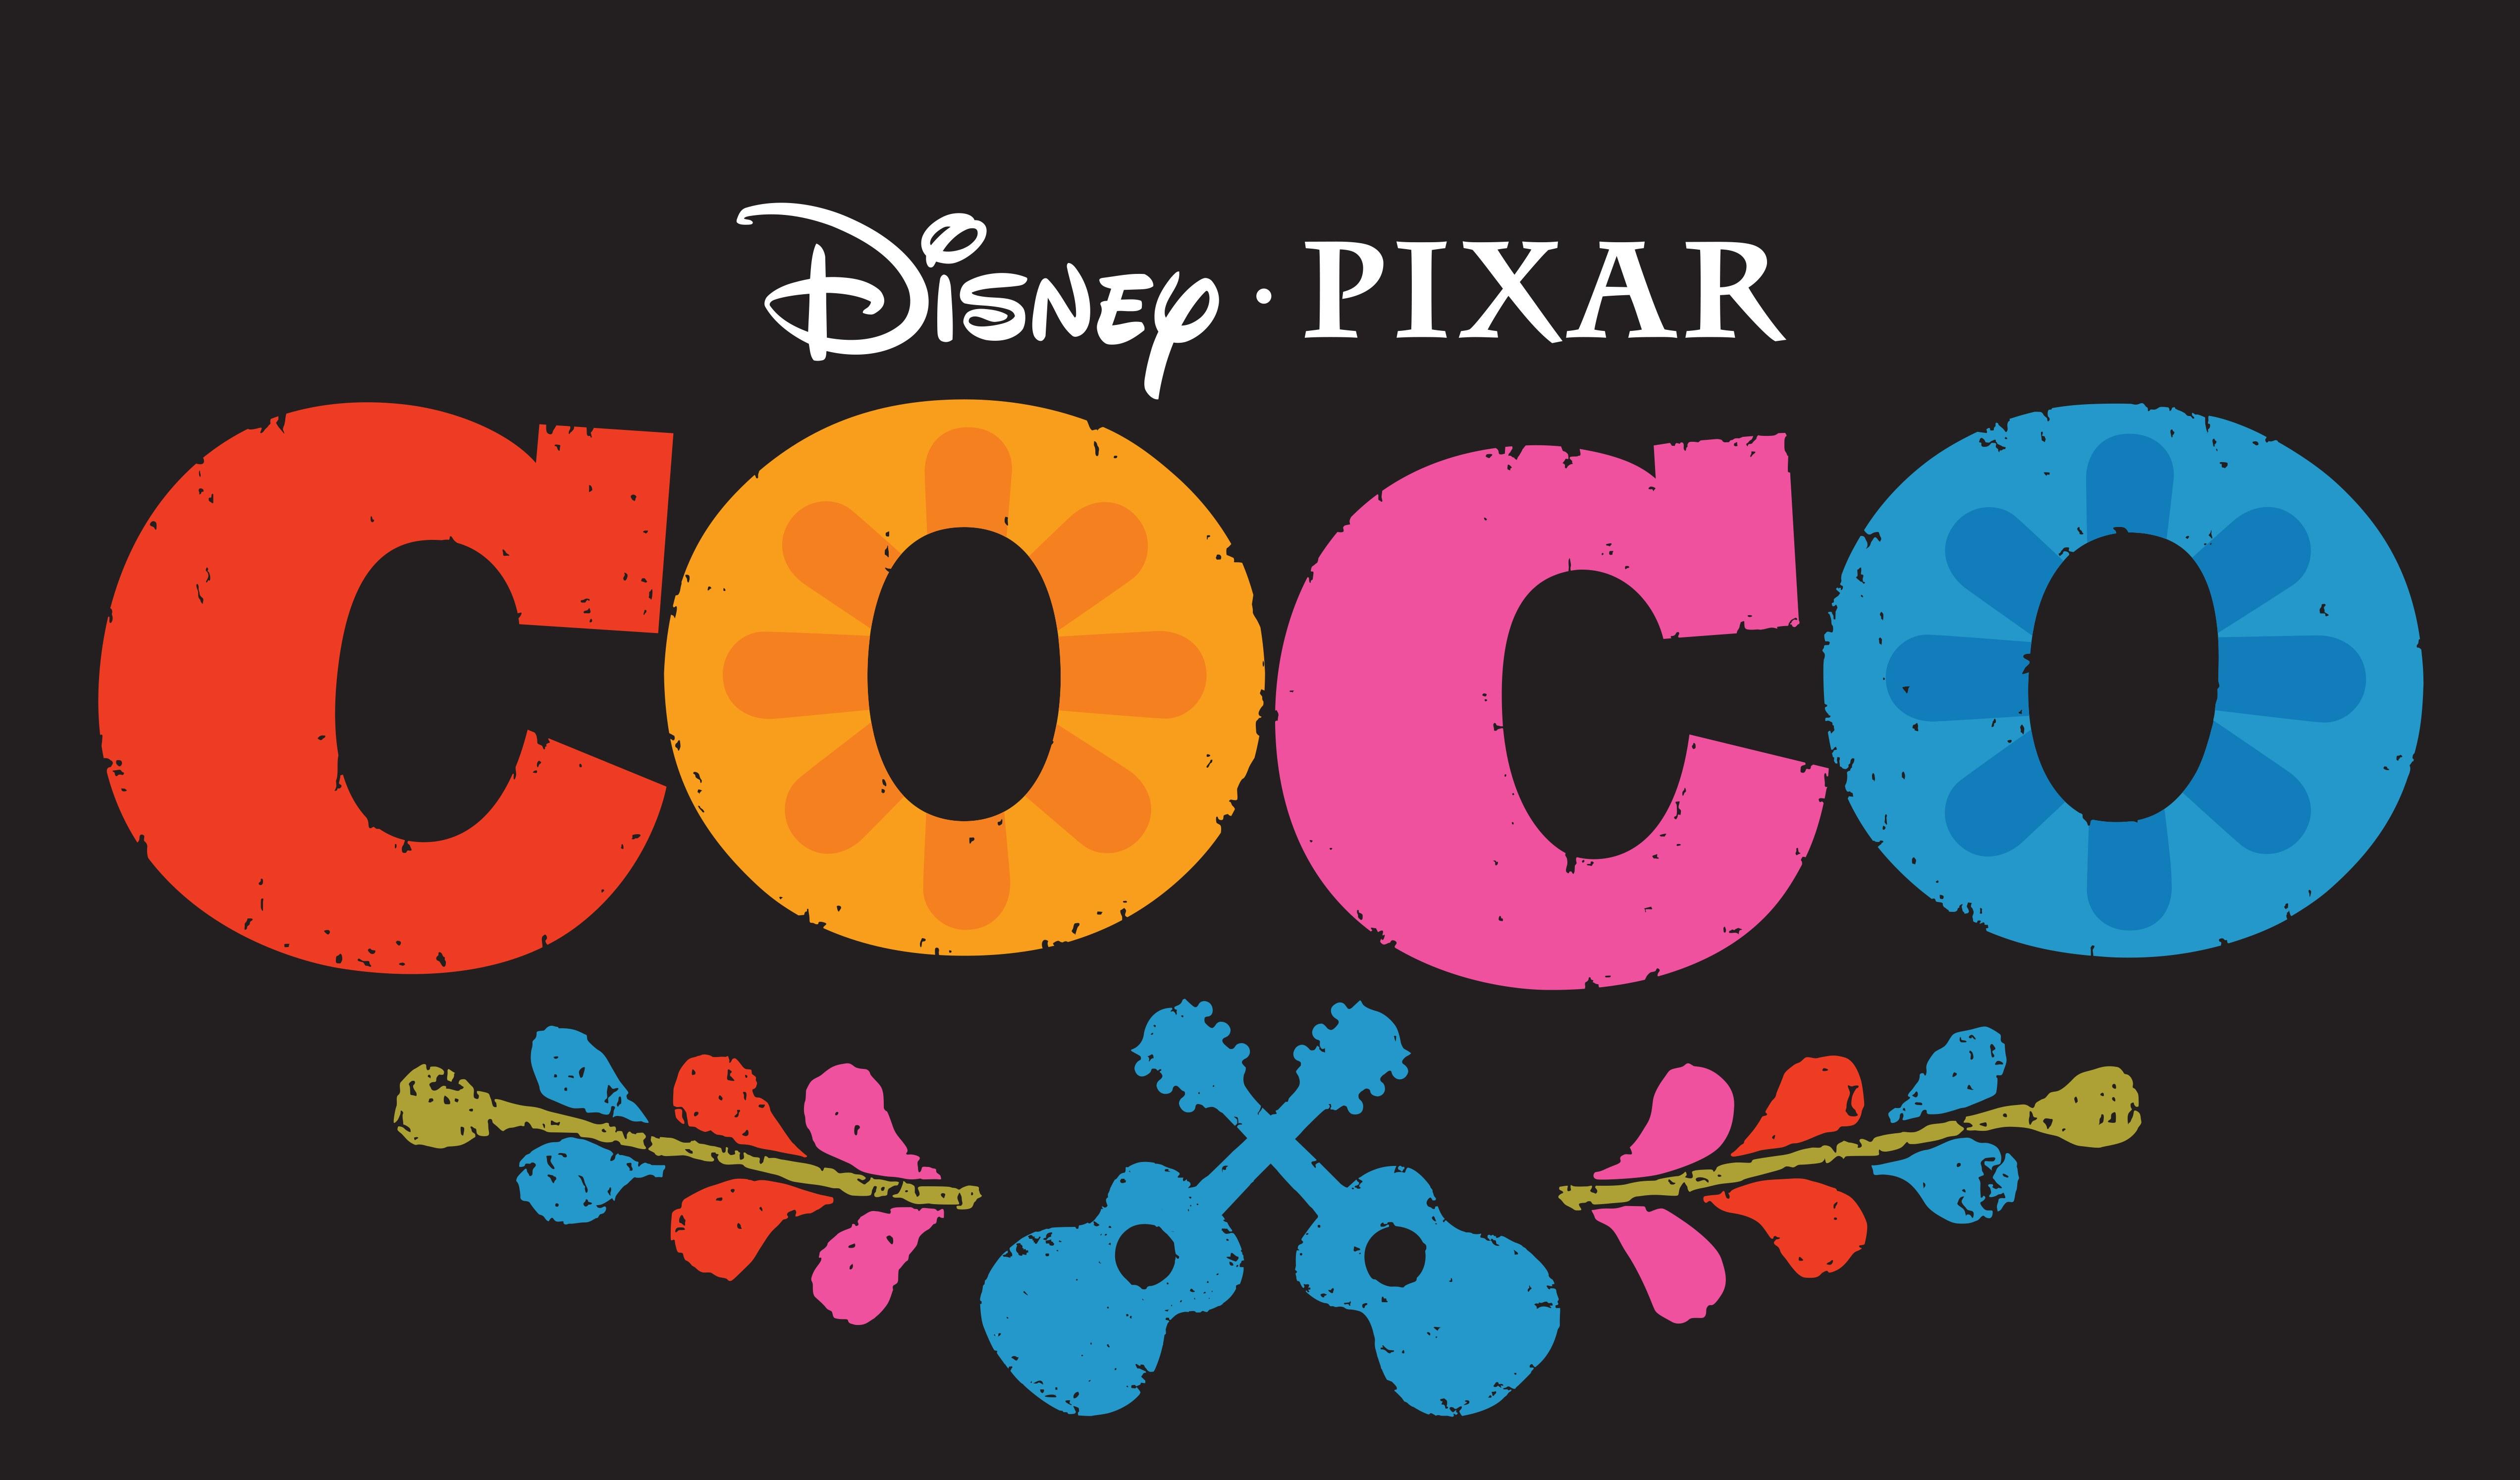 Coco Disney 2017 Movie